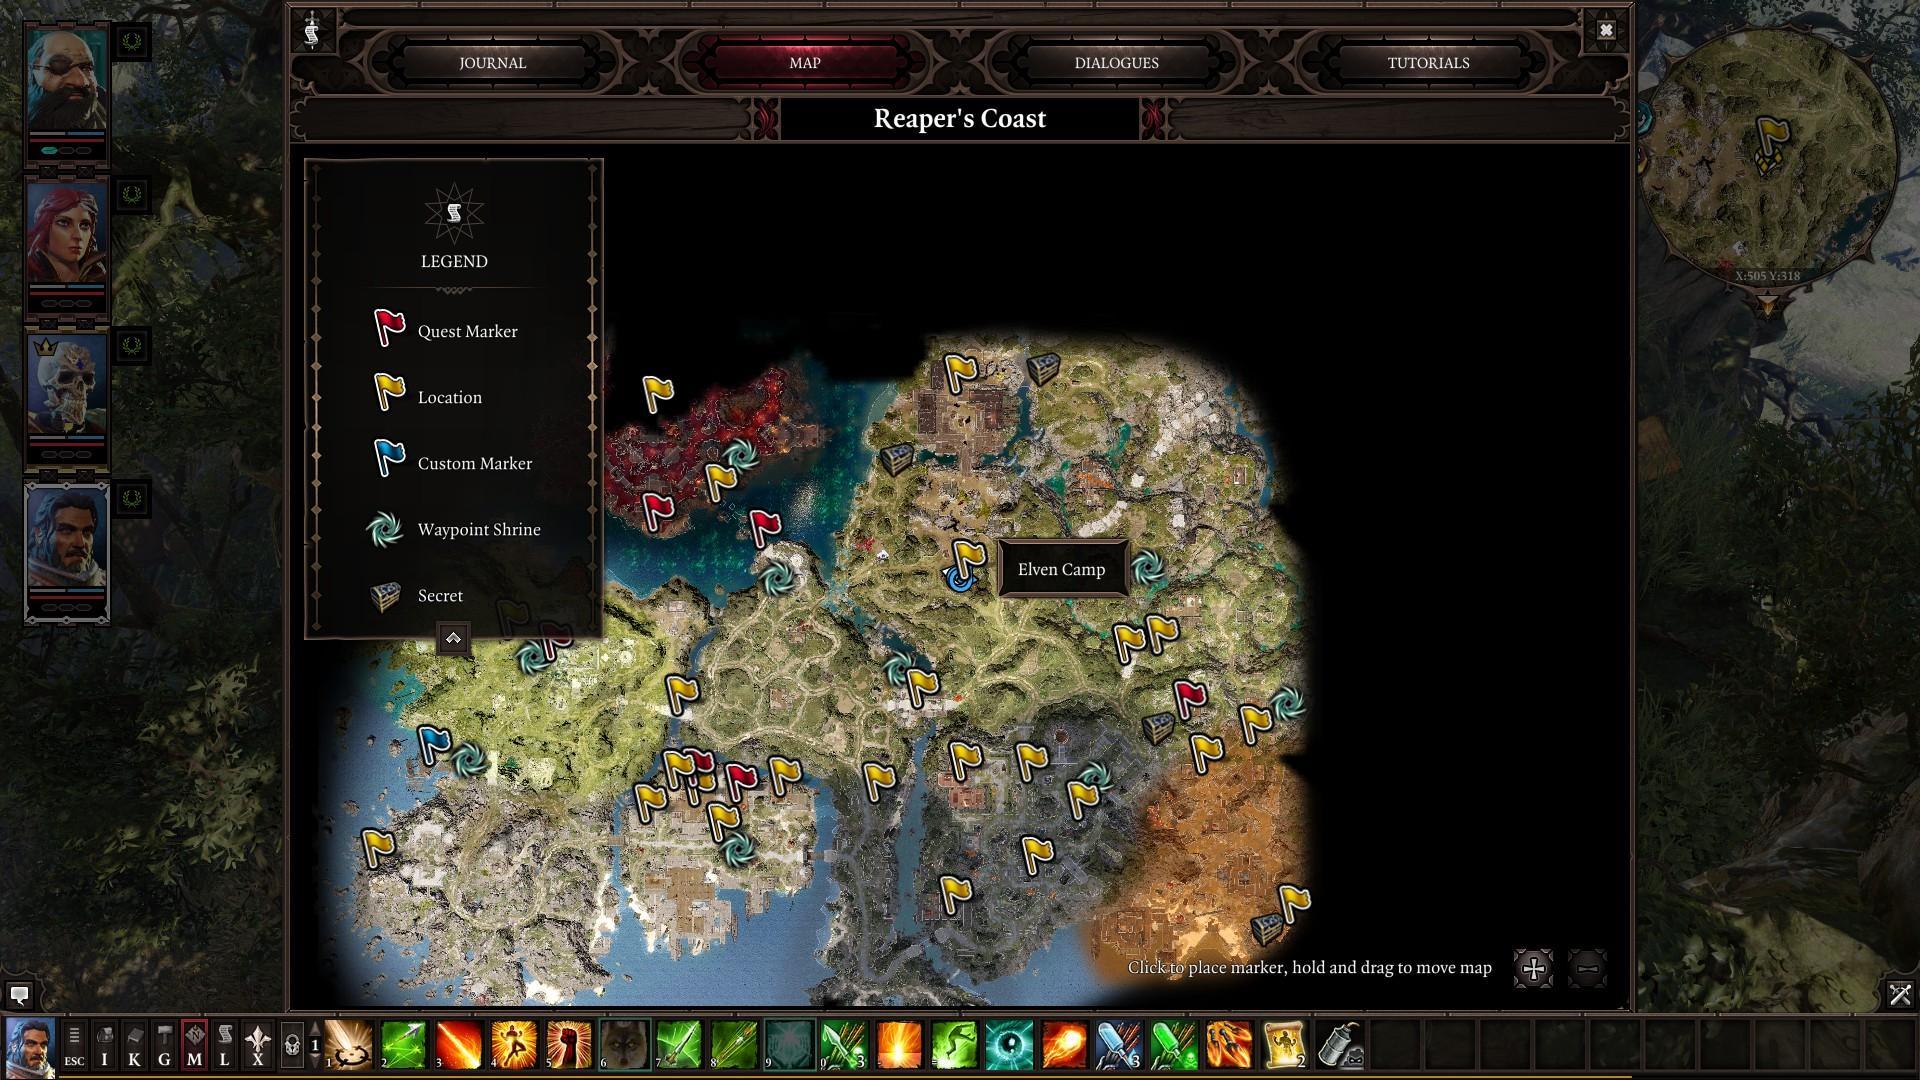 Divinity Original Sin 2 Unique Items In The Reaper S Coast